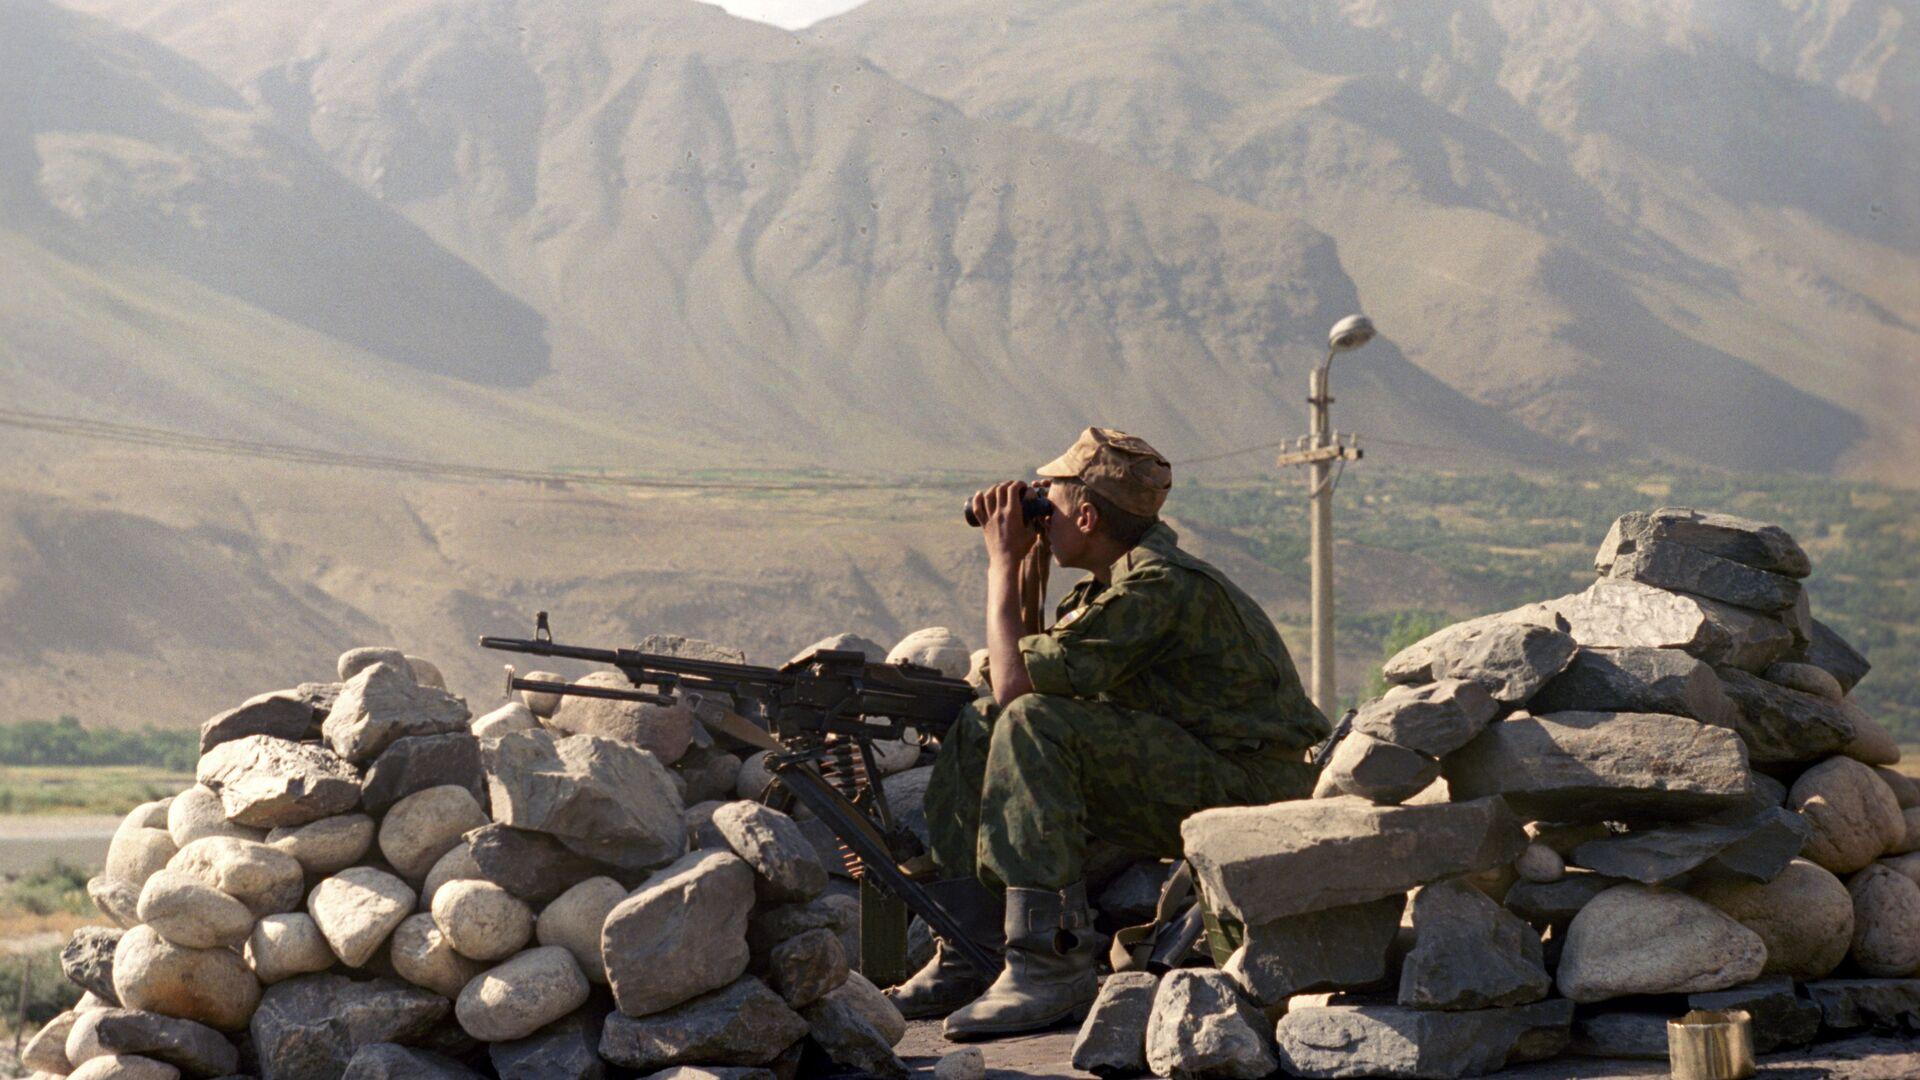 Солдат вооруженных сил Таджикистана на границе с Афганистаном, архивное фото - Sputnik Тоҷикистон, 1920, 15.09.2021